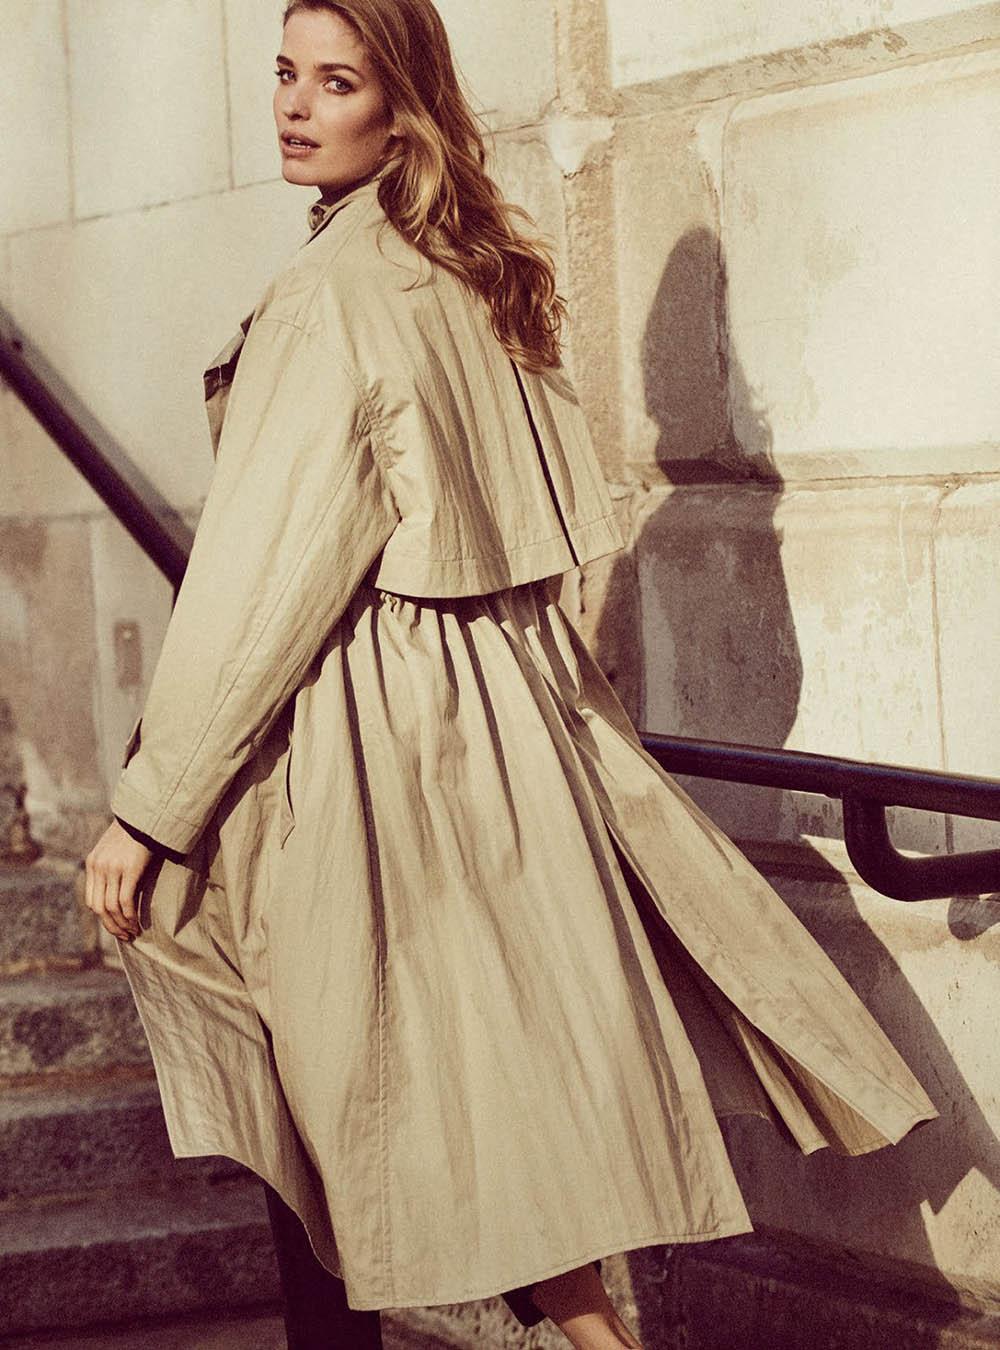 Alisa-Ahmann-by-Regan-Cameron-for-Harper's-Bazaar-UK-March-2019-10.jpg